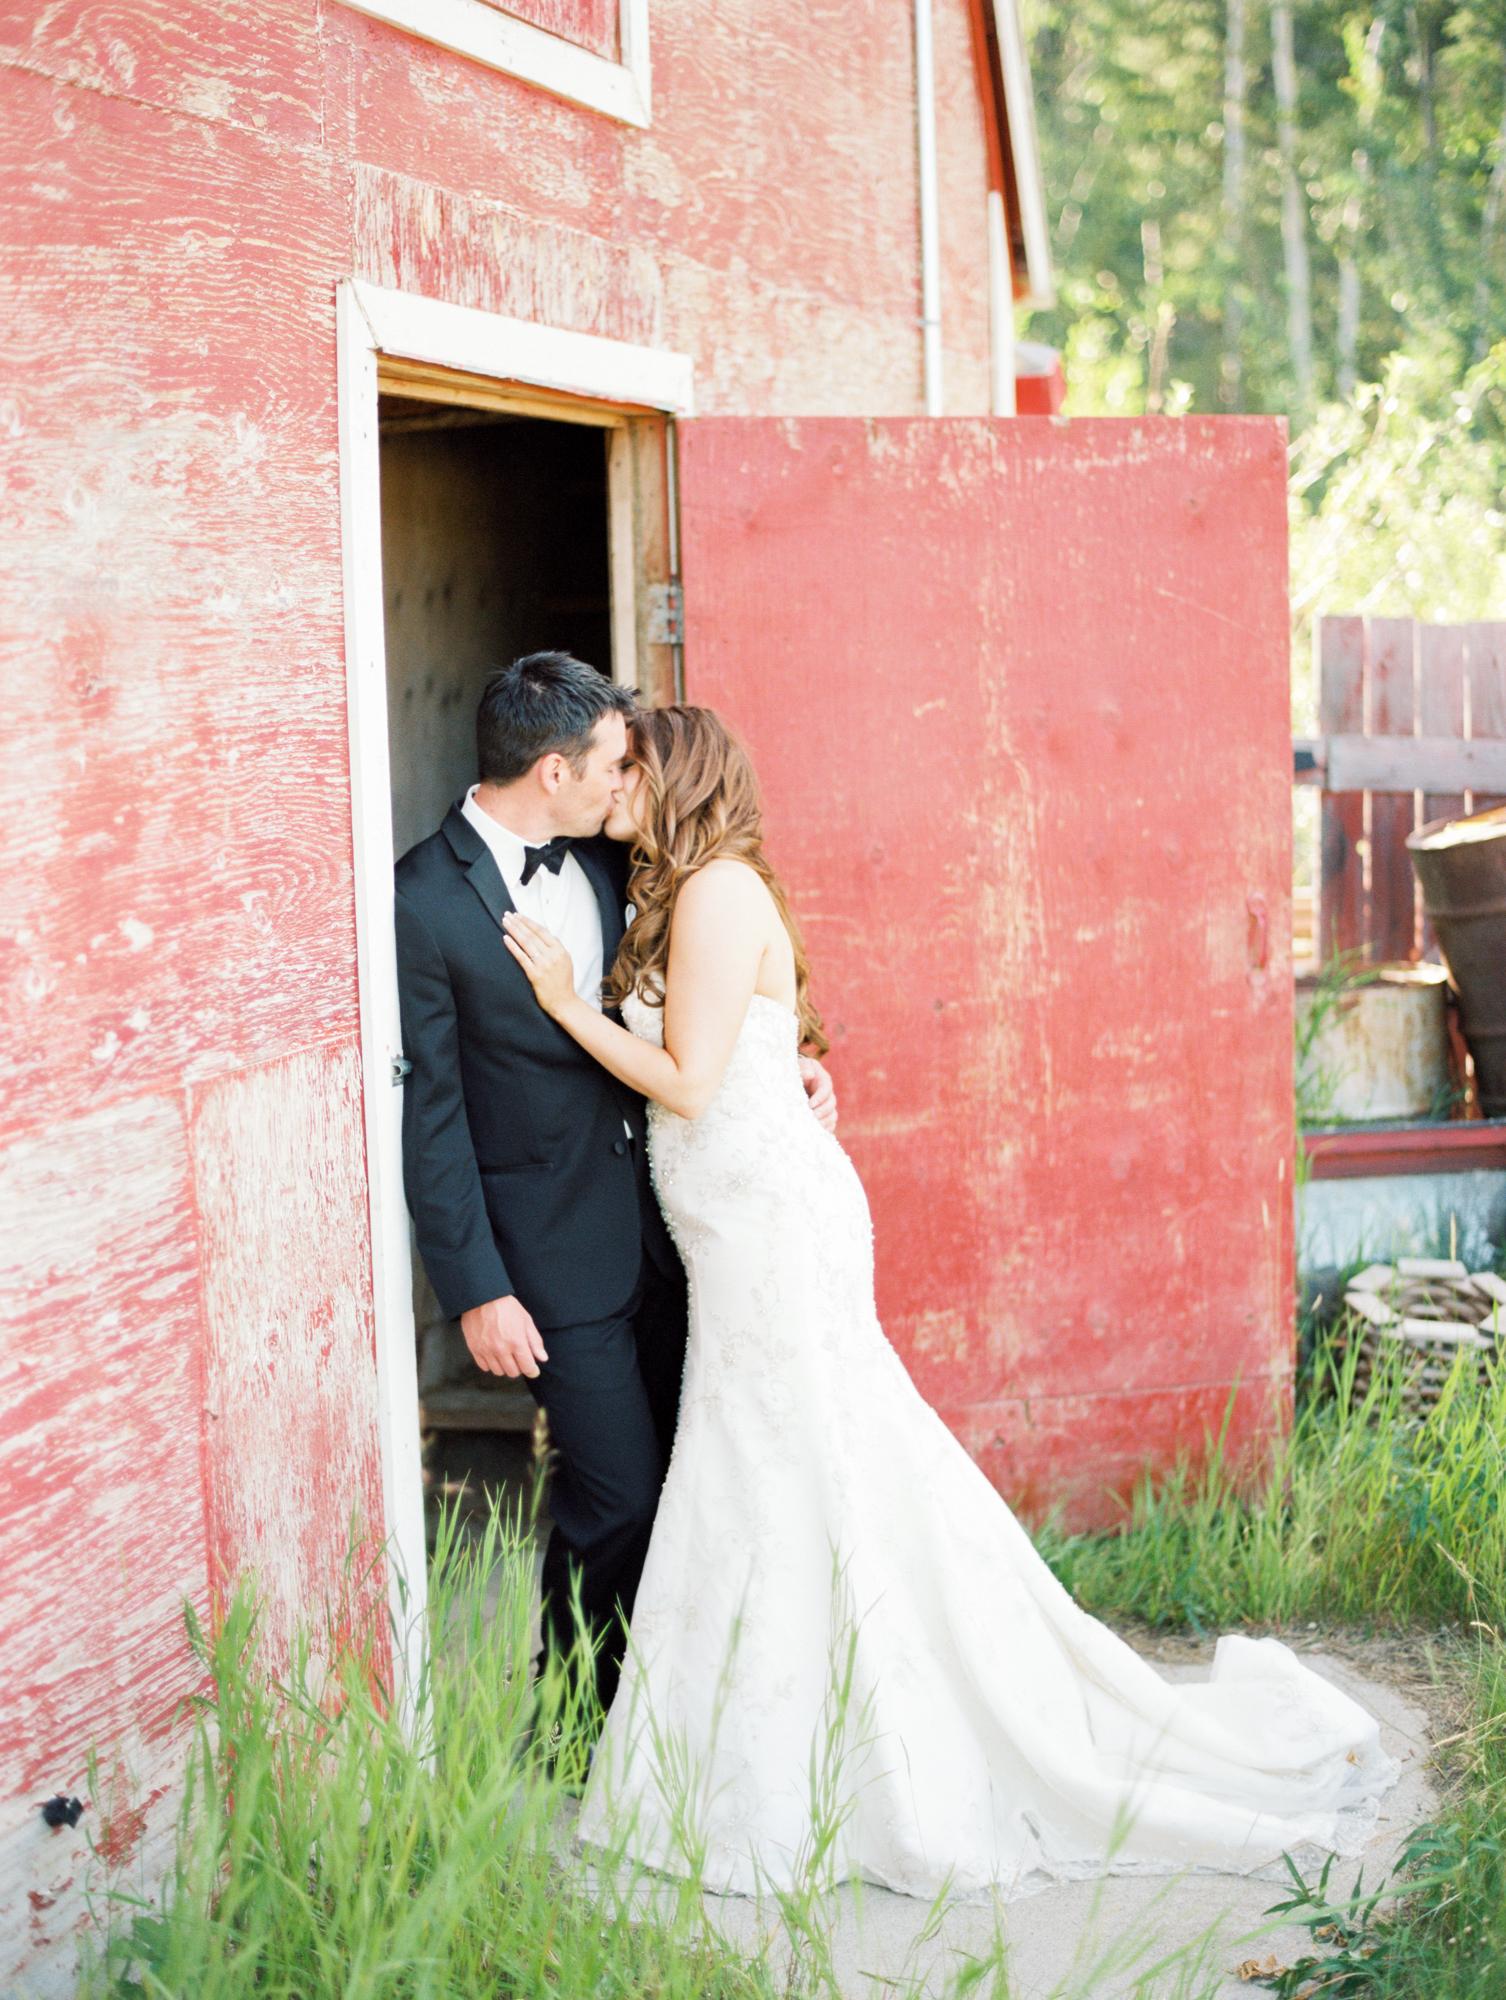 Bride and groom kissing at rustic barn